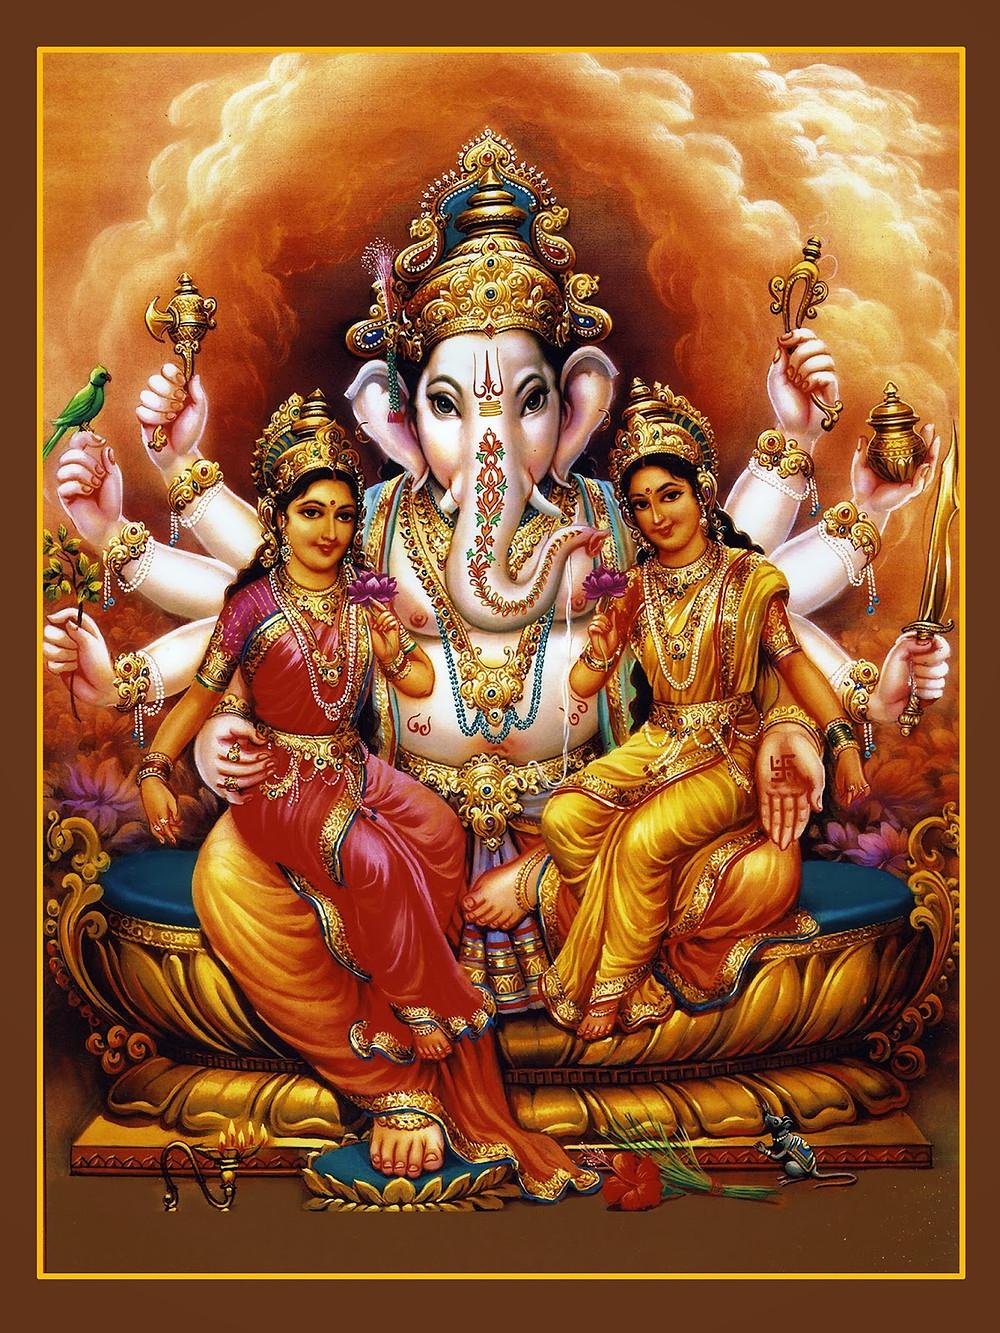 Lord Ganesha with Buddhi and Siddhi.